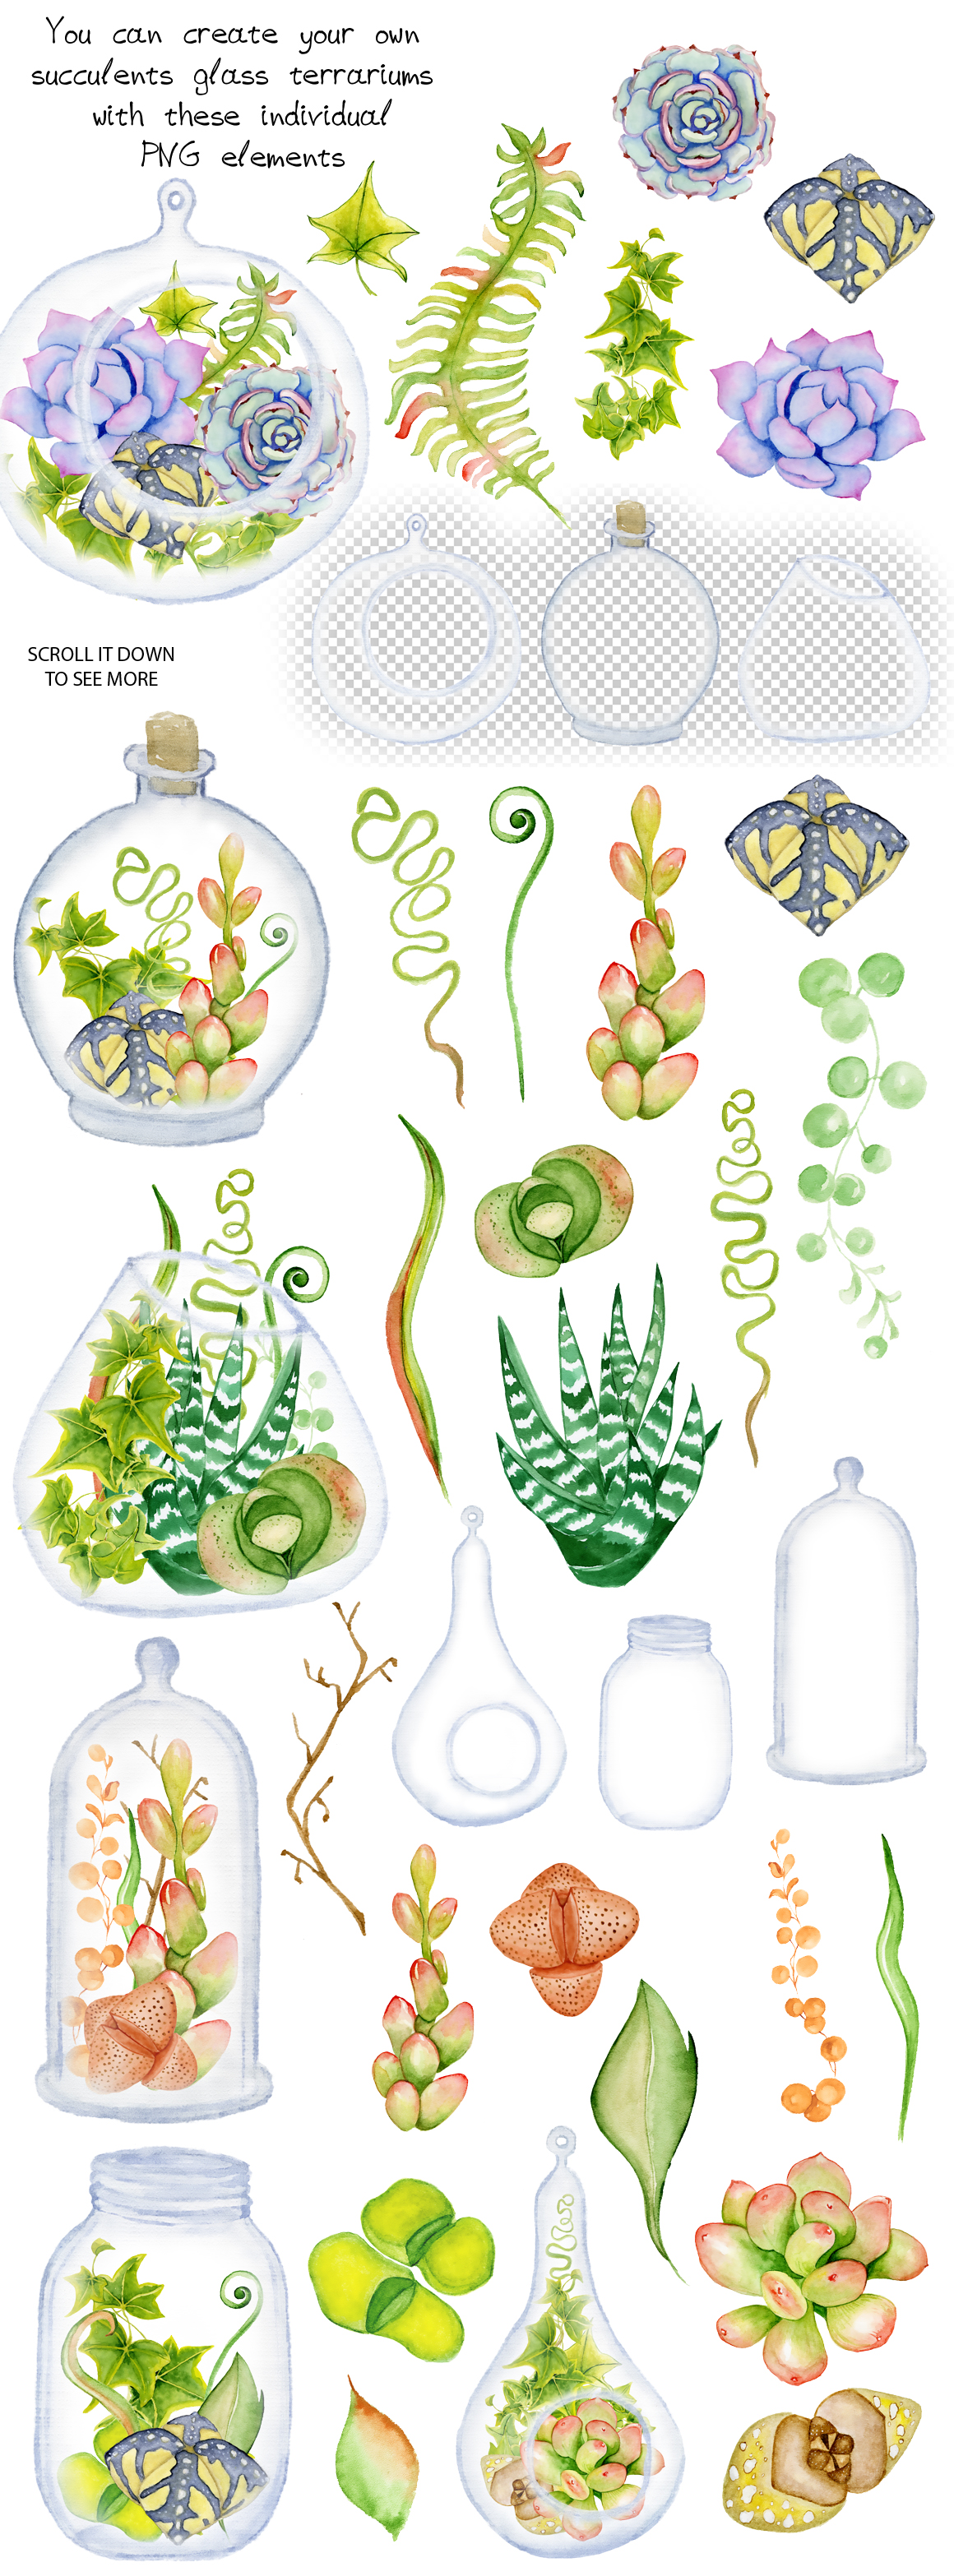 Succulents Terrarium Creator Vol 2 In Illustrations On Yellow Images Creative Store